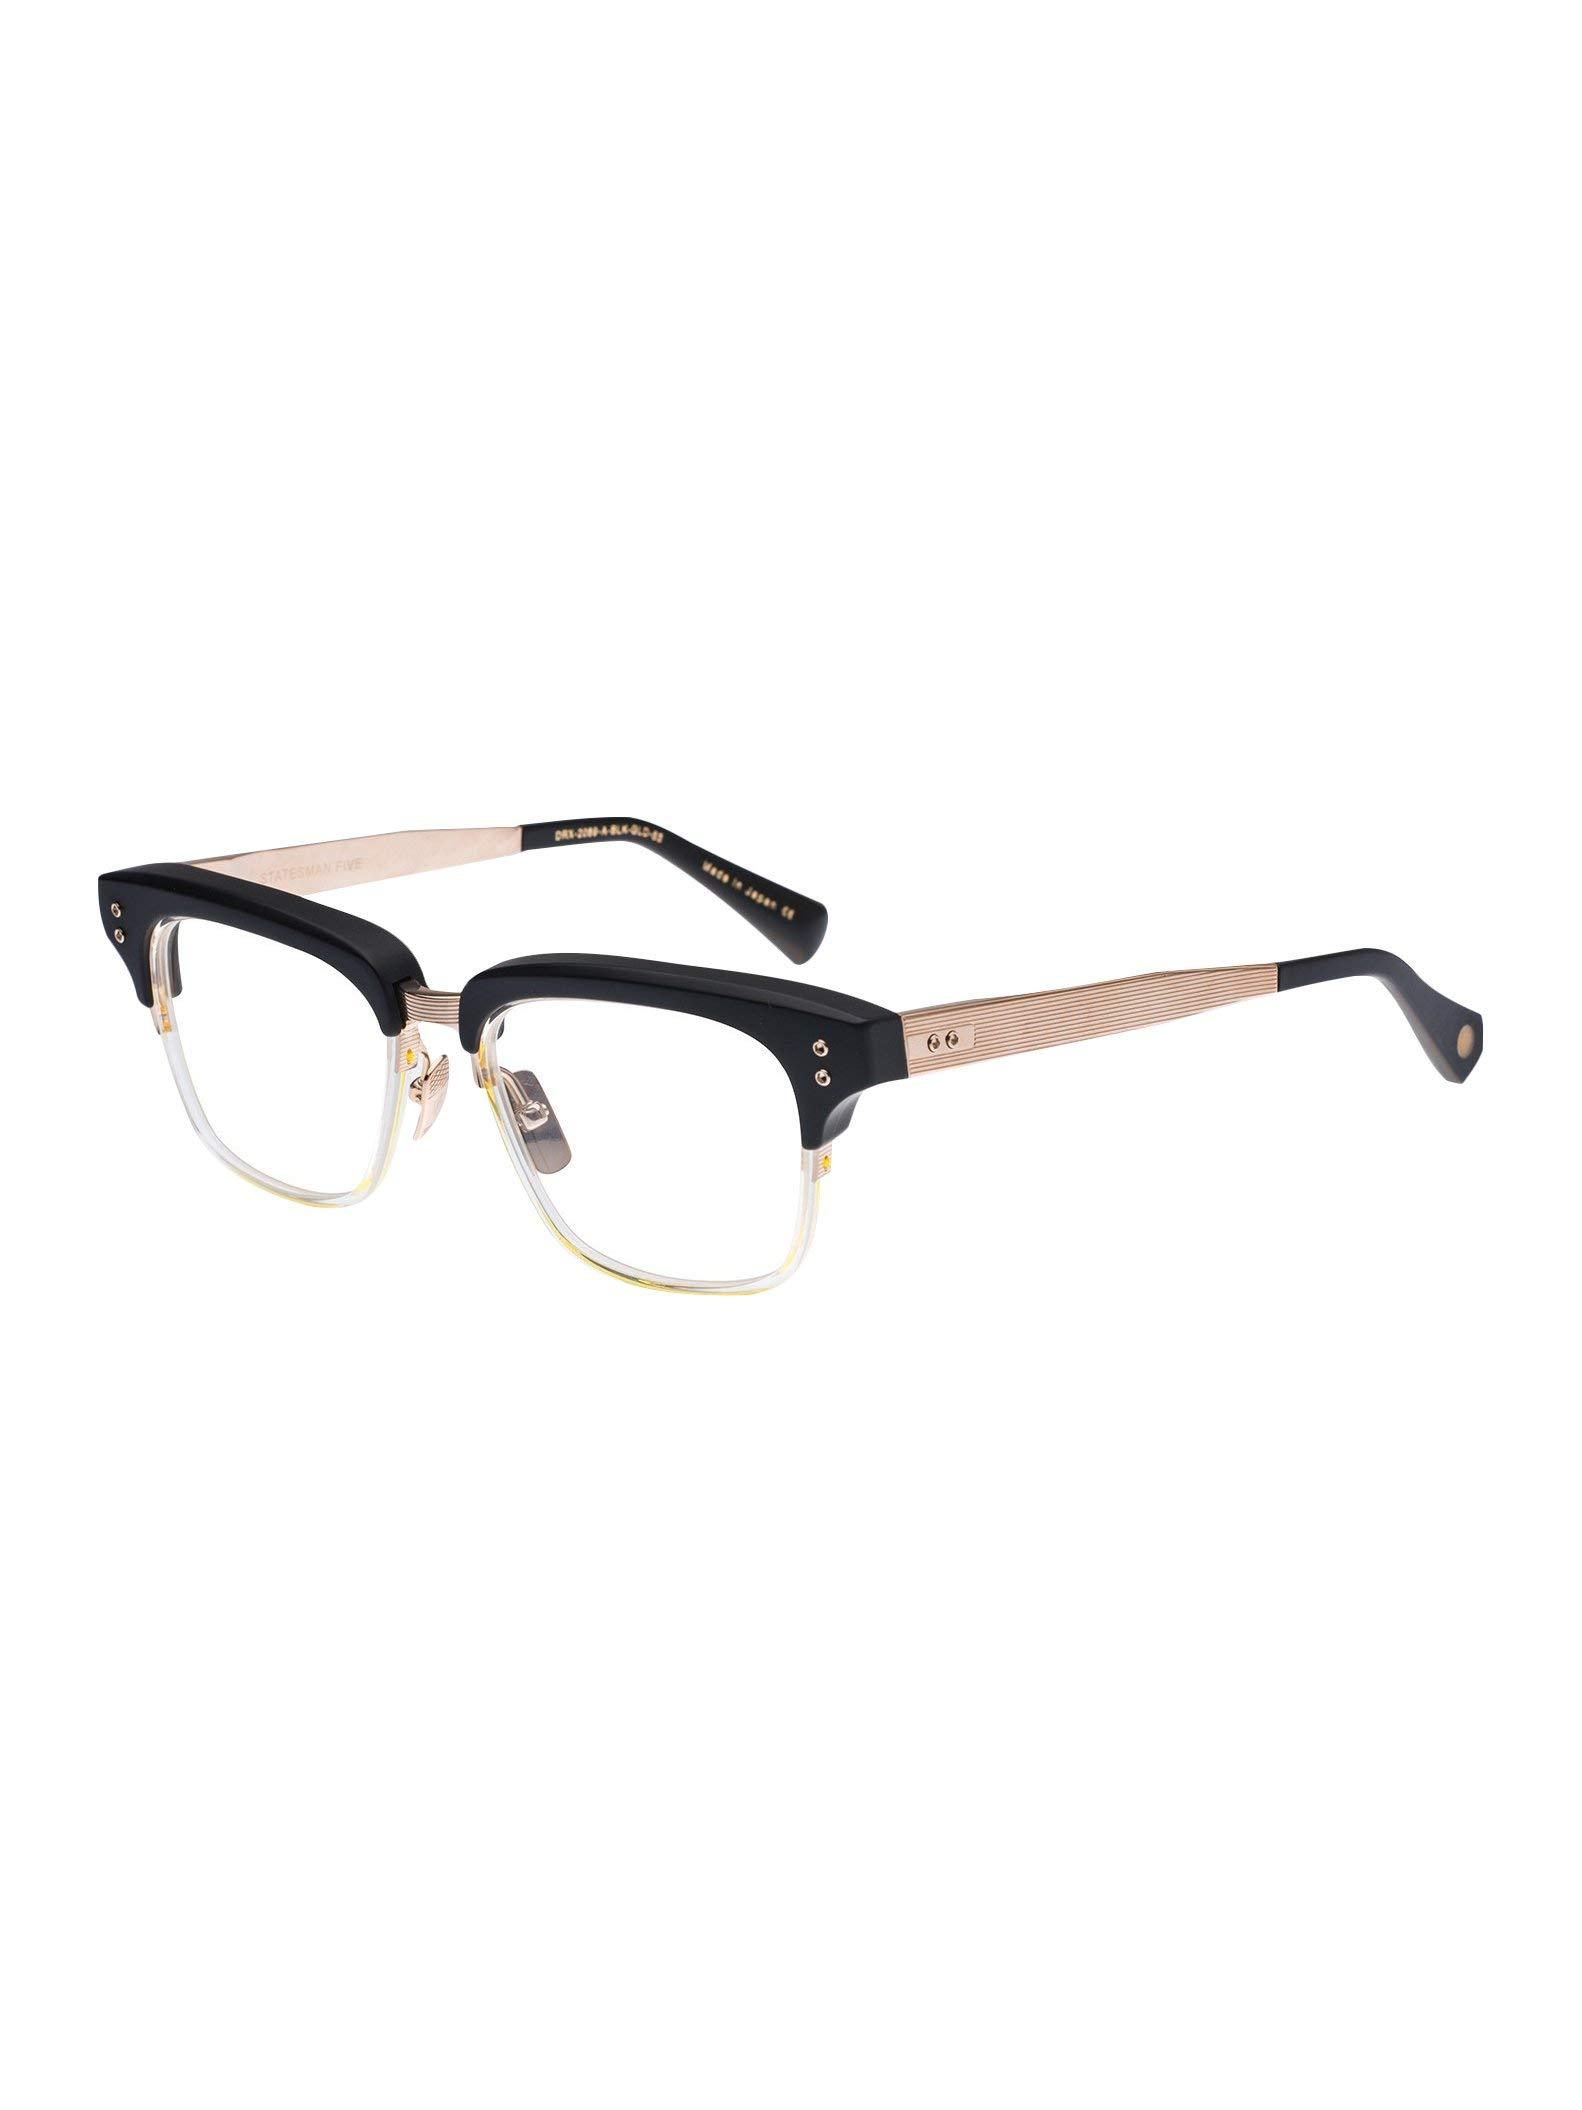 Eyeglasses Dita INTELLIGENTE DRX 2050 B-TKT-GUN Matte Tokyo Tortoise-Gun Metal